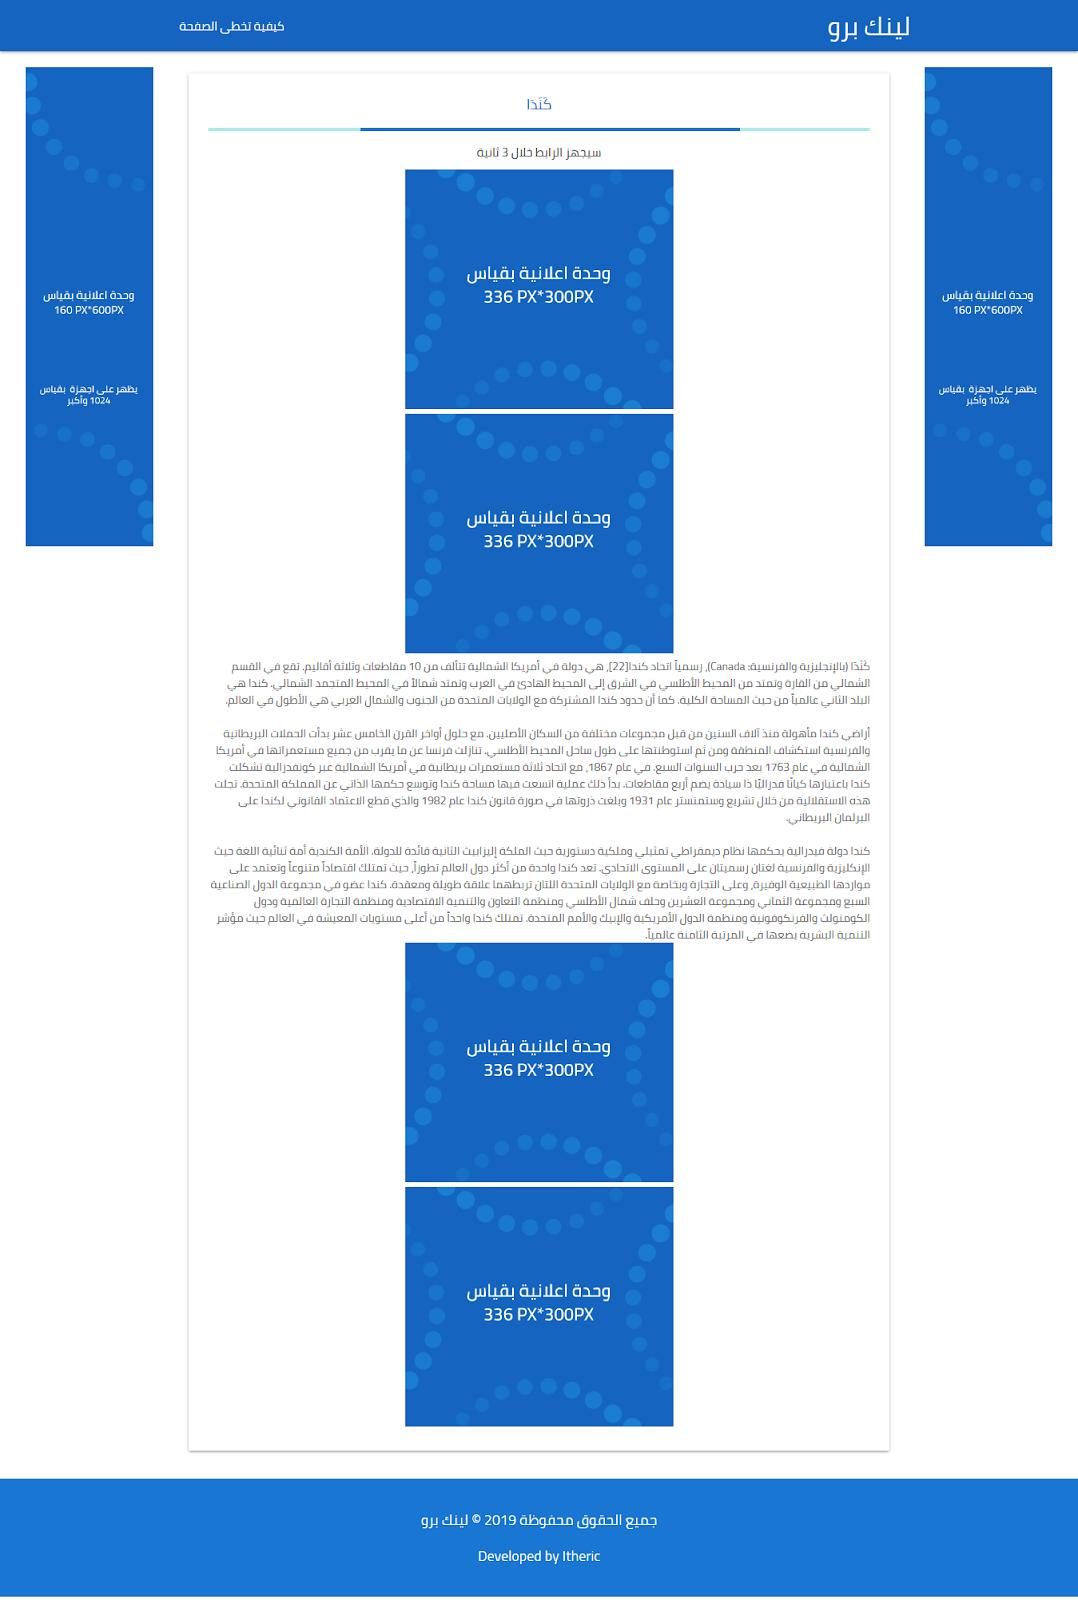 قالب لينك برو قالب اختصار روابط Link Pro Template